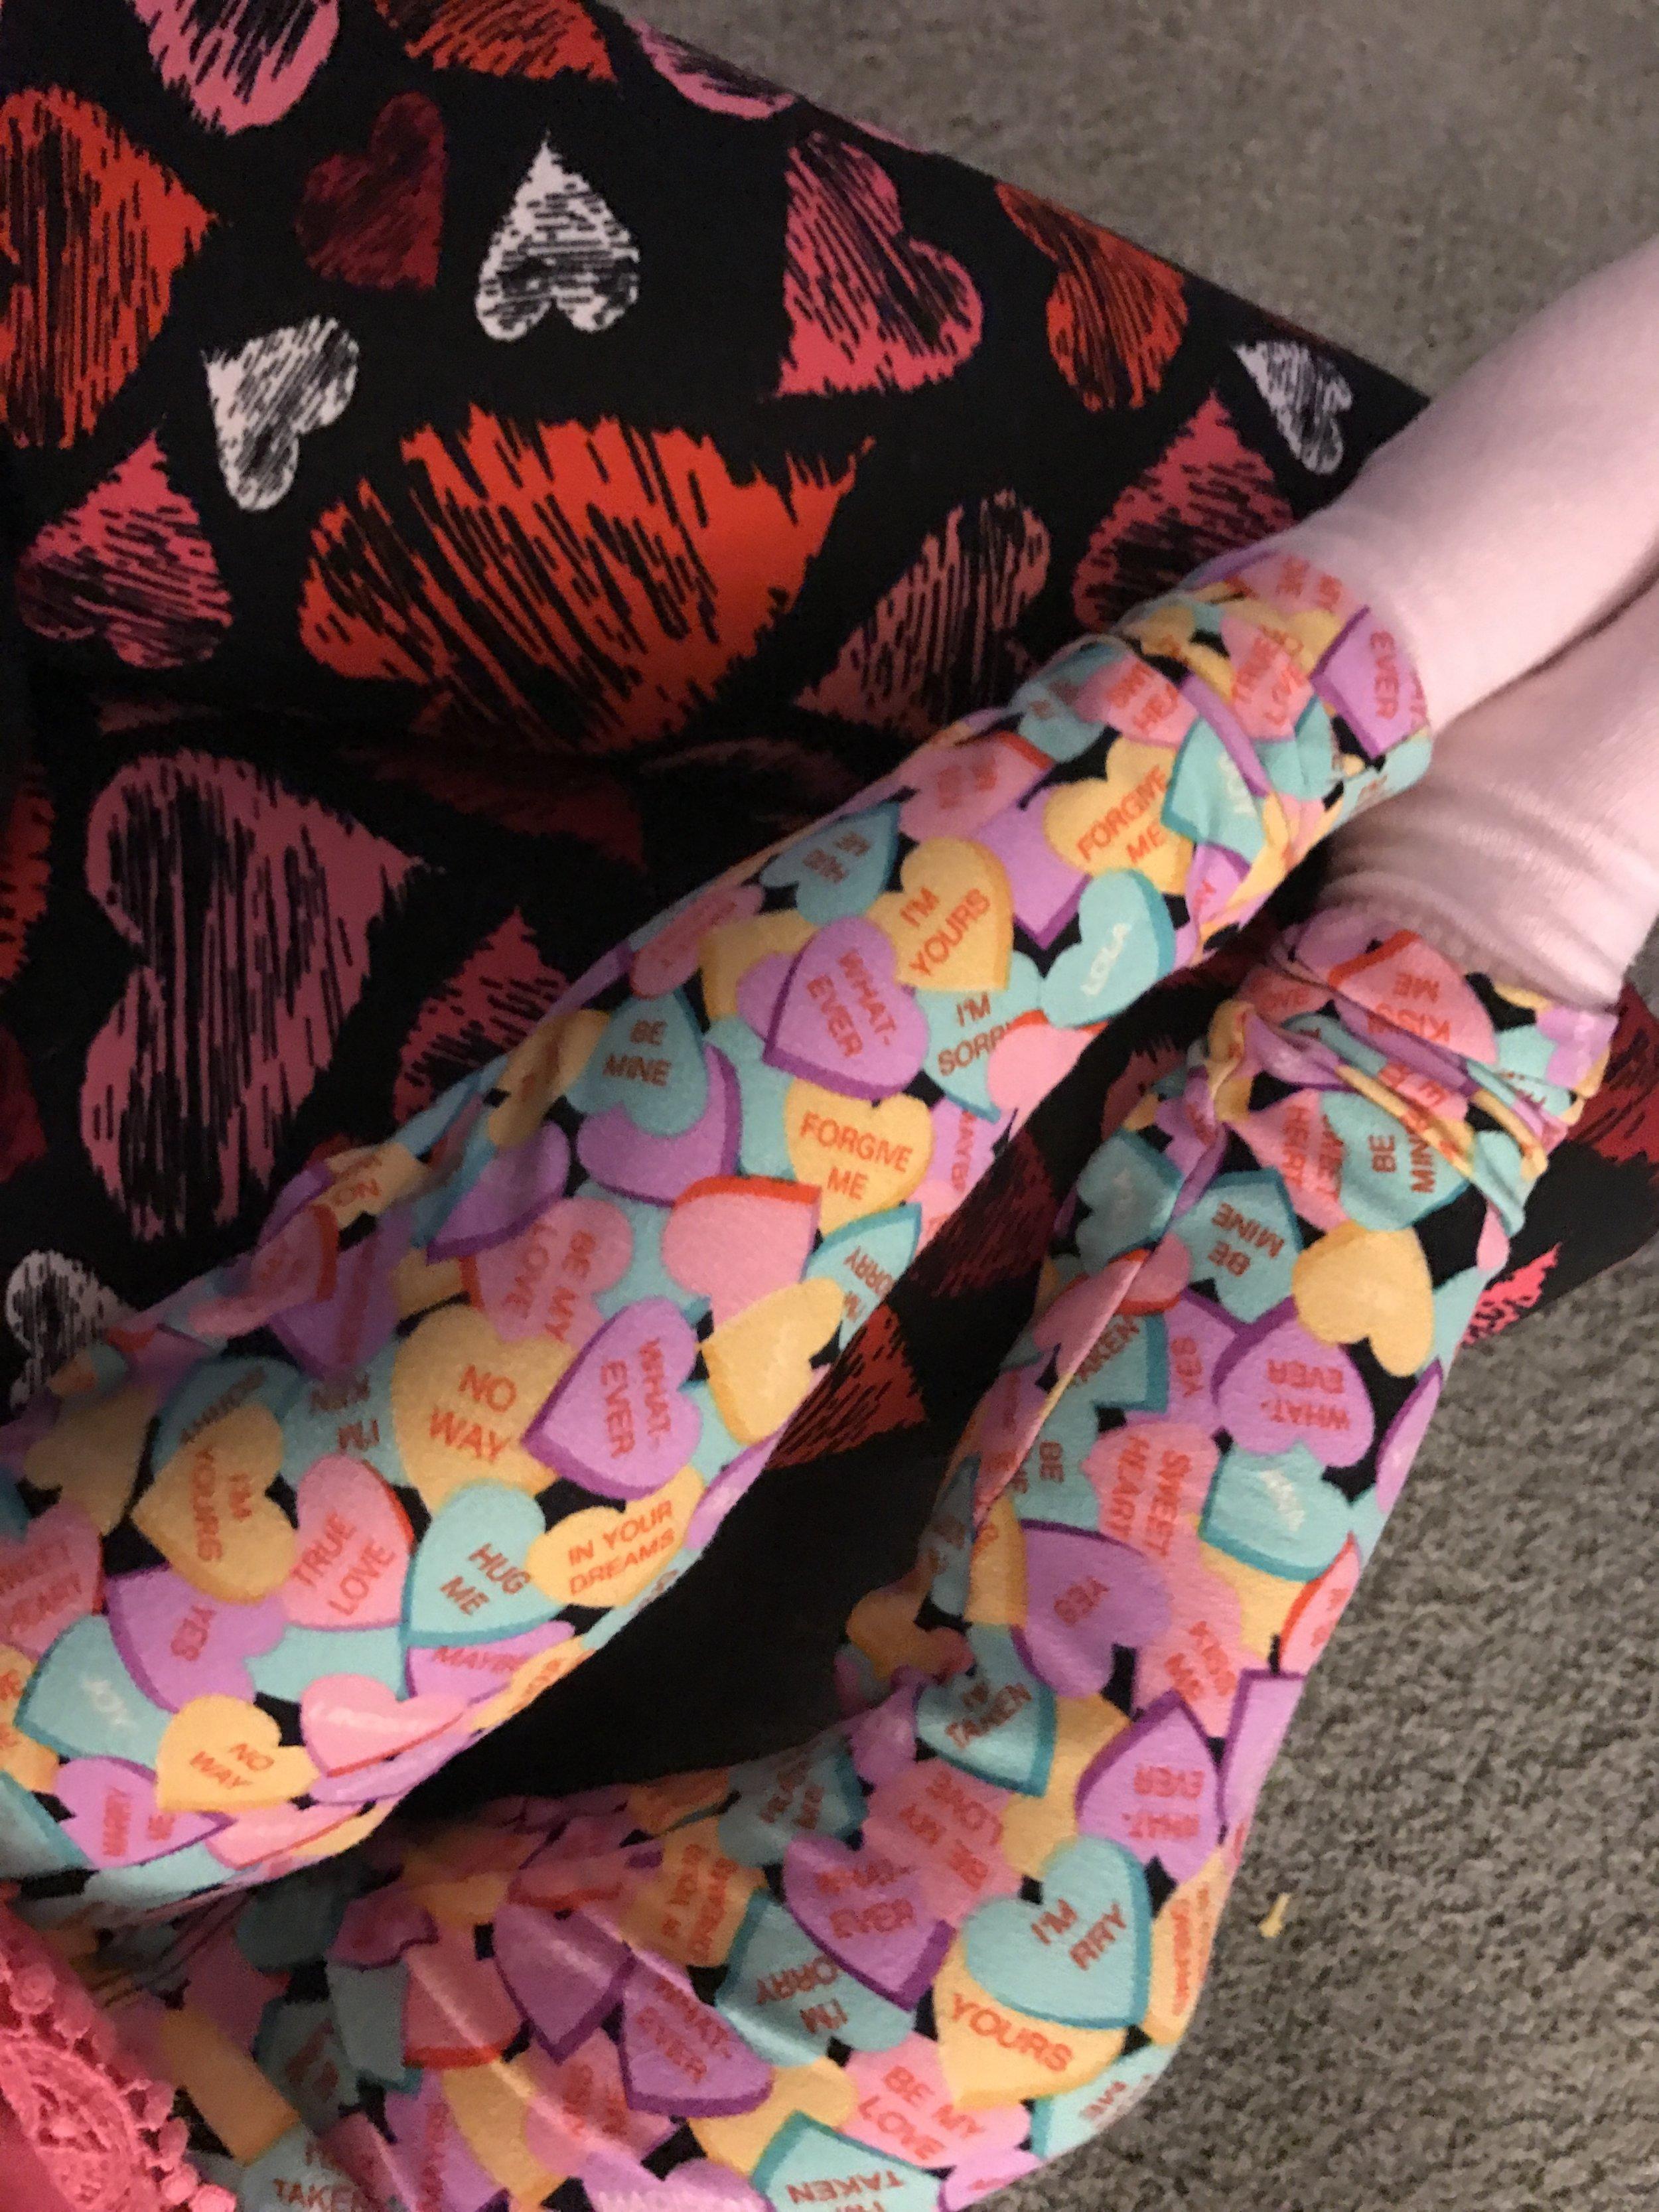 Heart leggings! Cuteness overload!